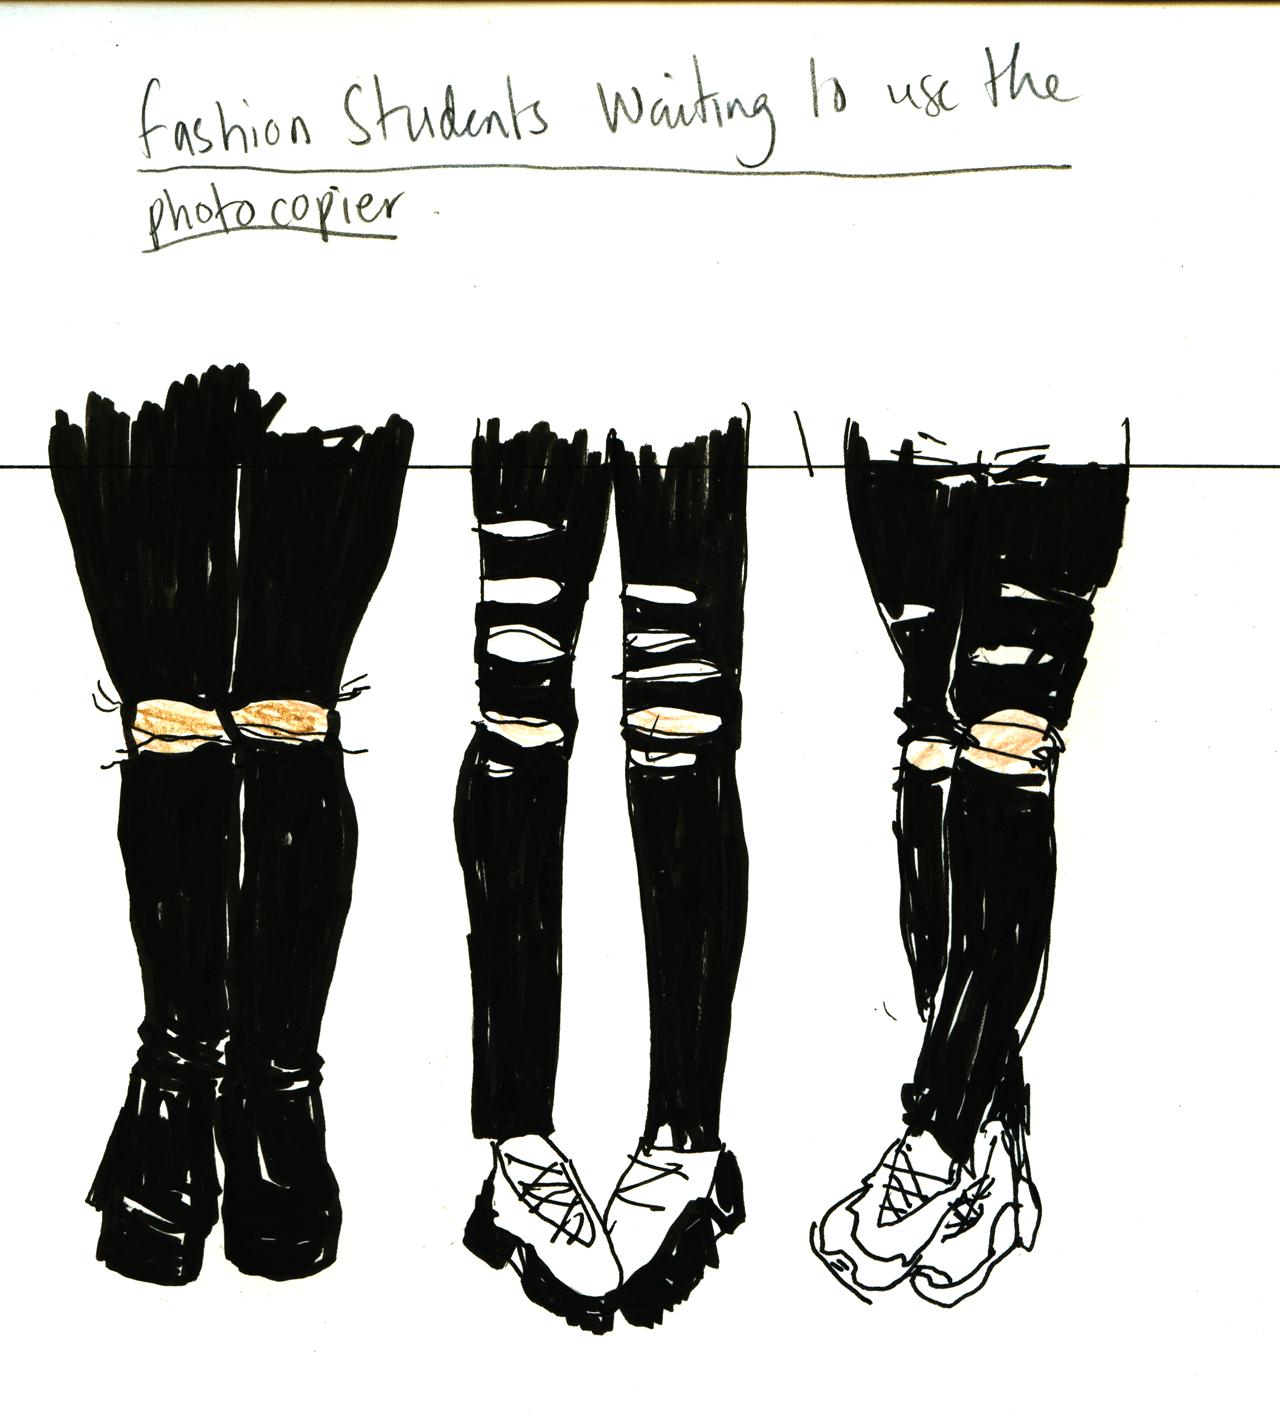 FashionStudents